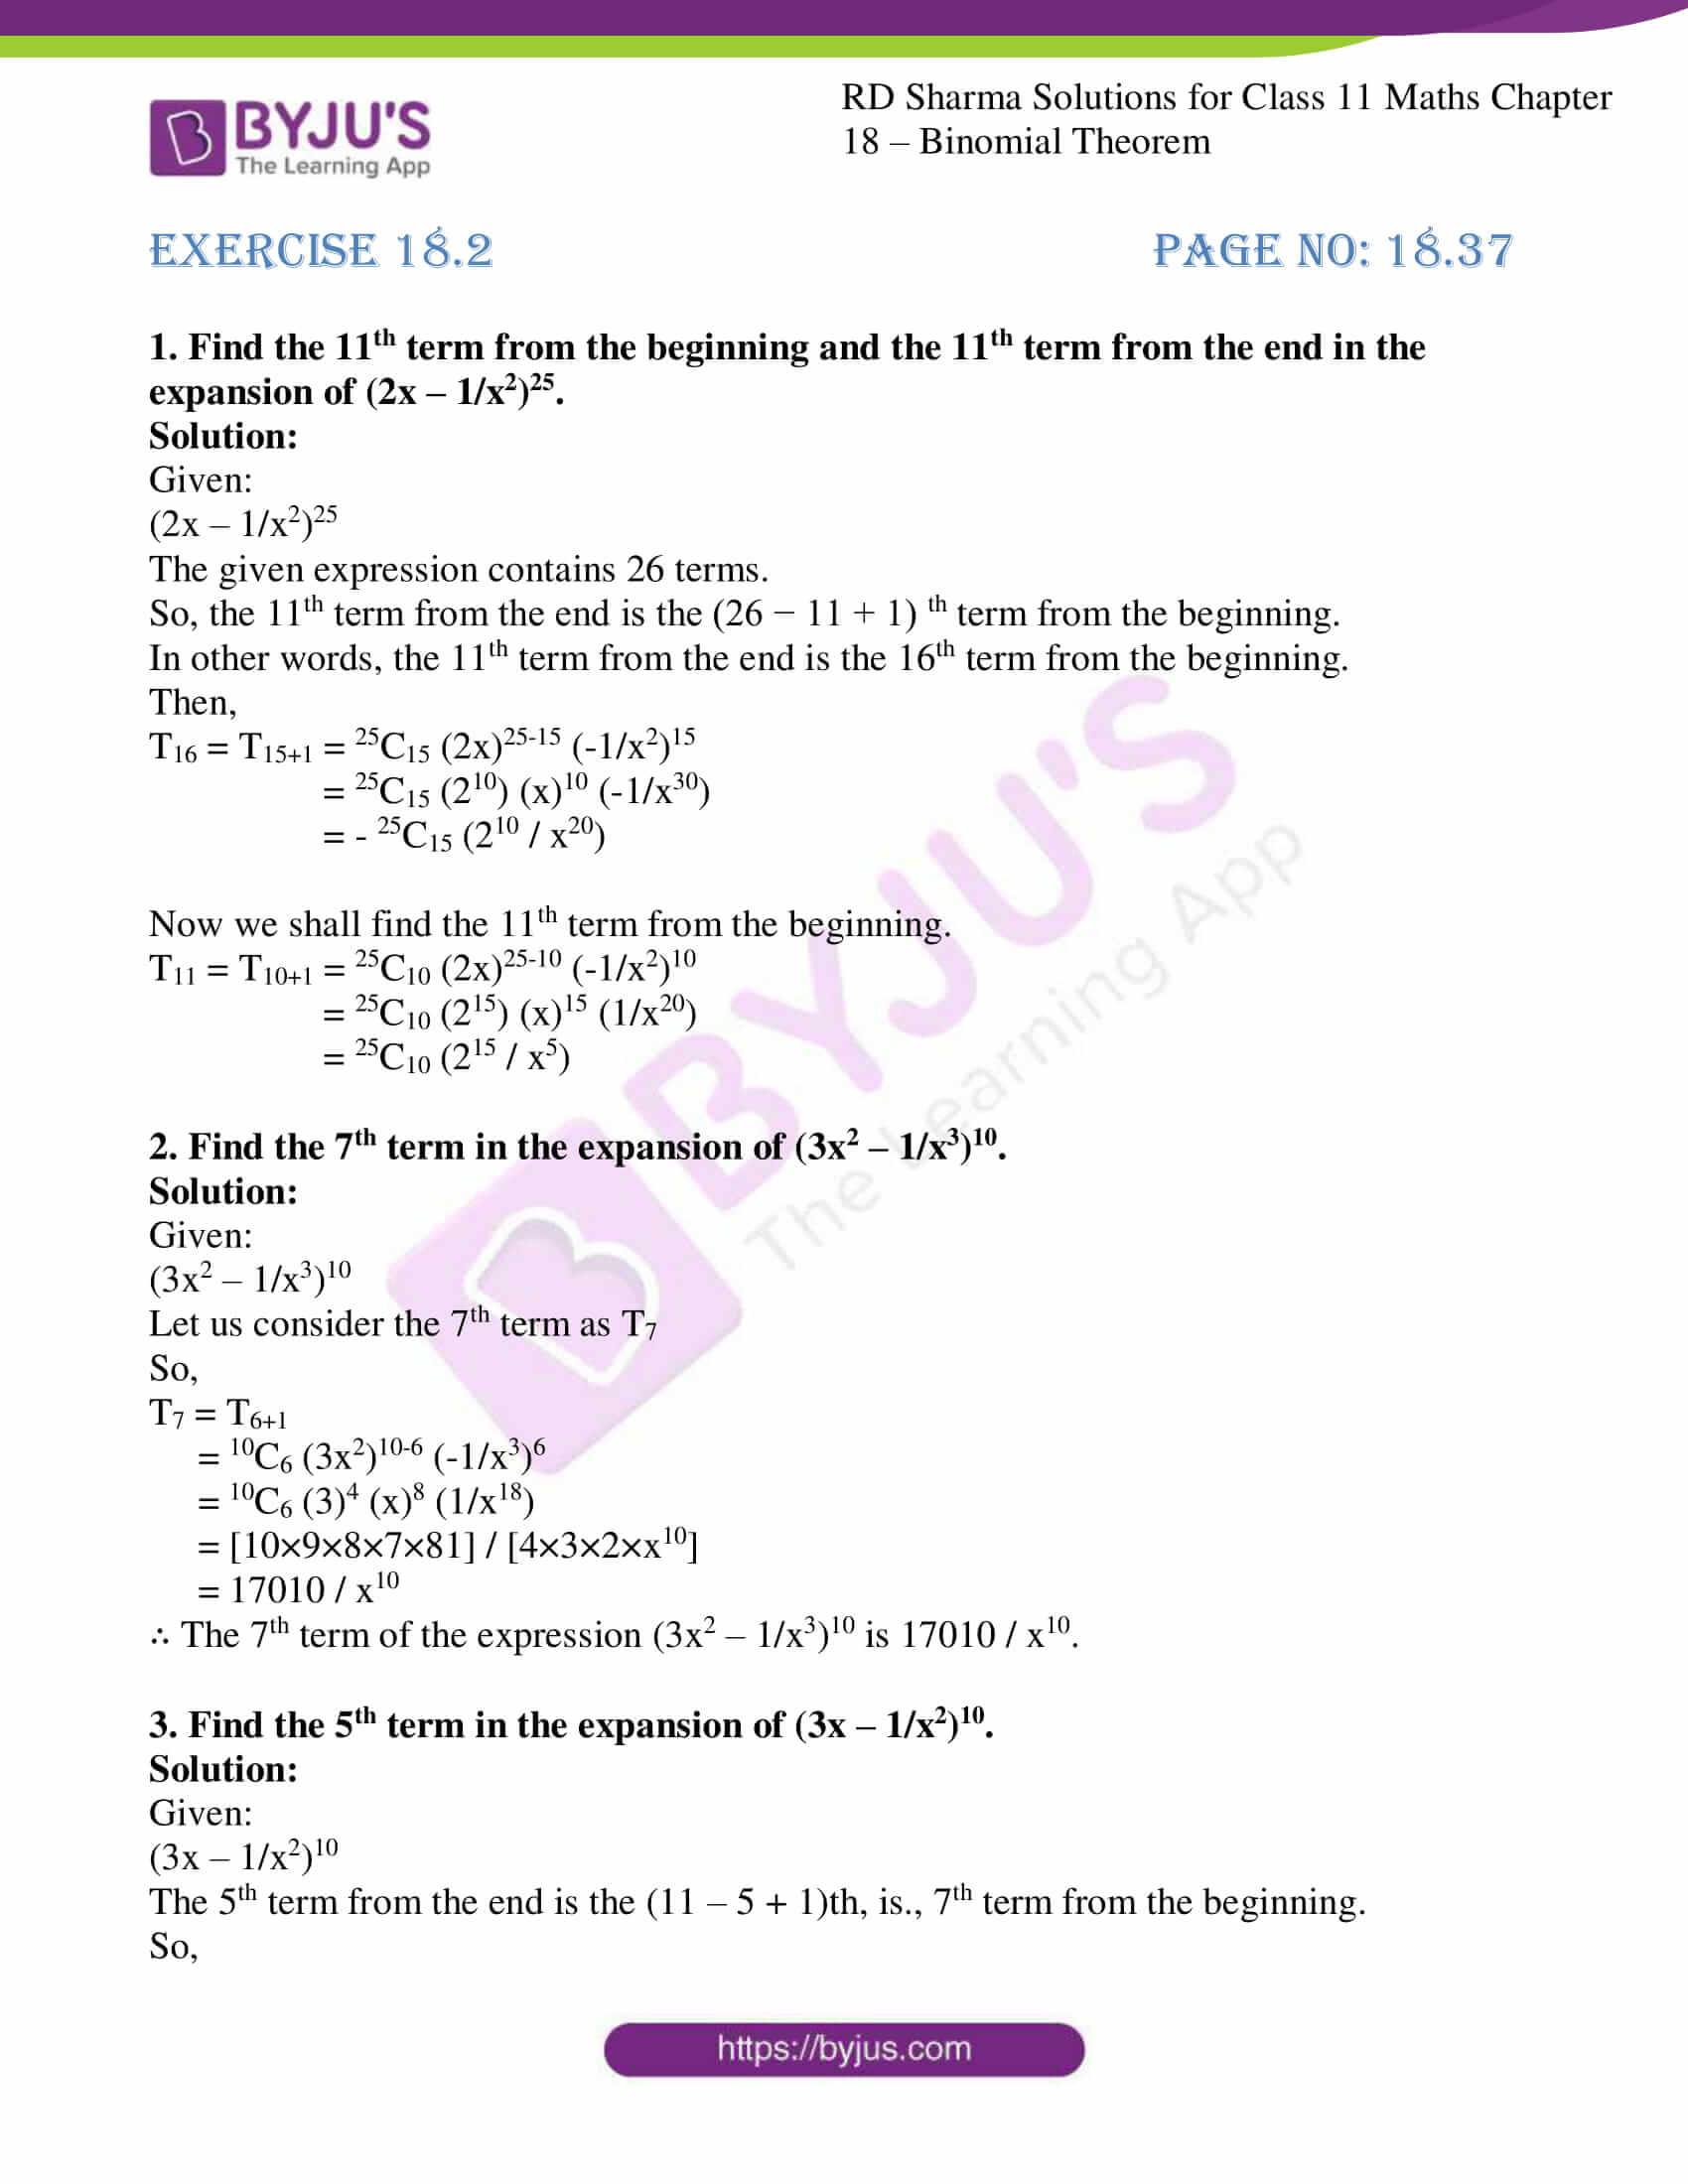 rd sharma class 11 maths ch 18 ex 2 01